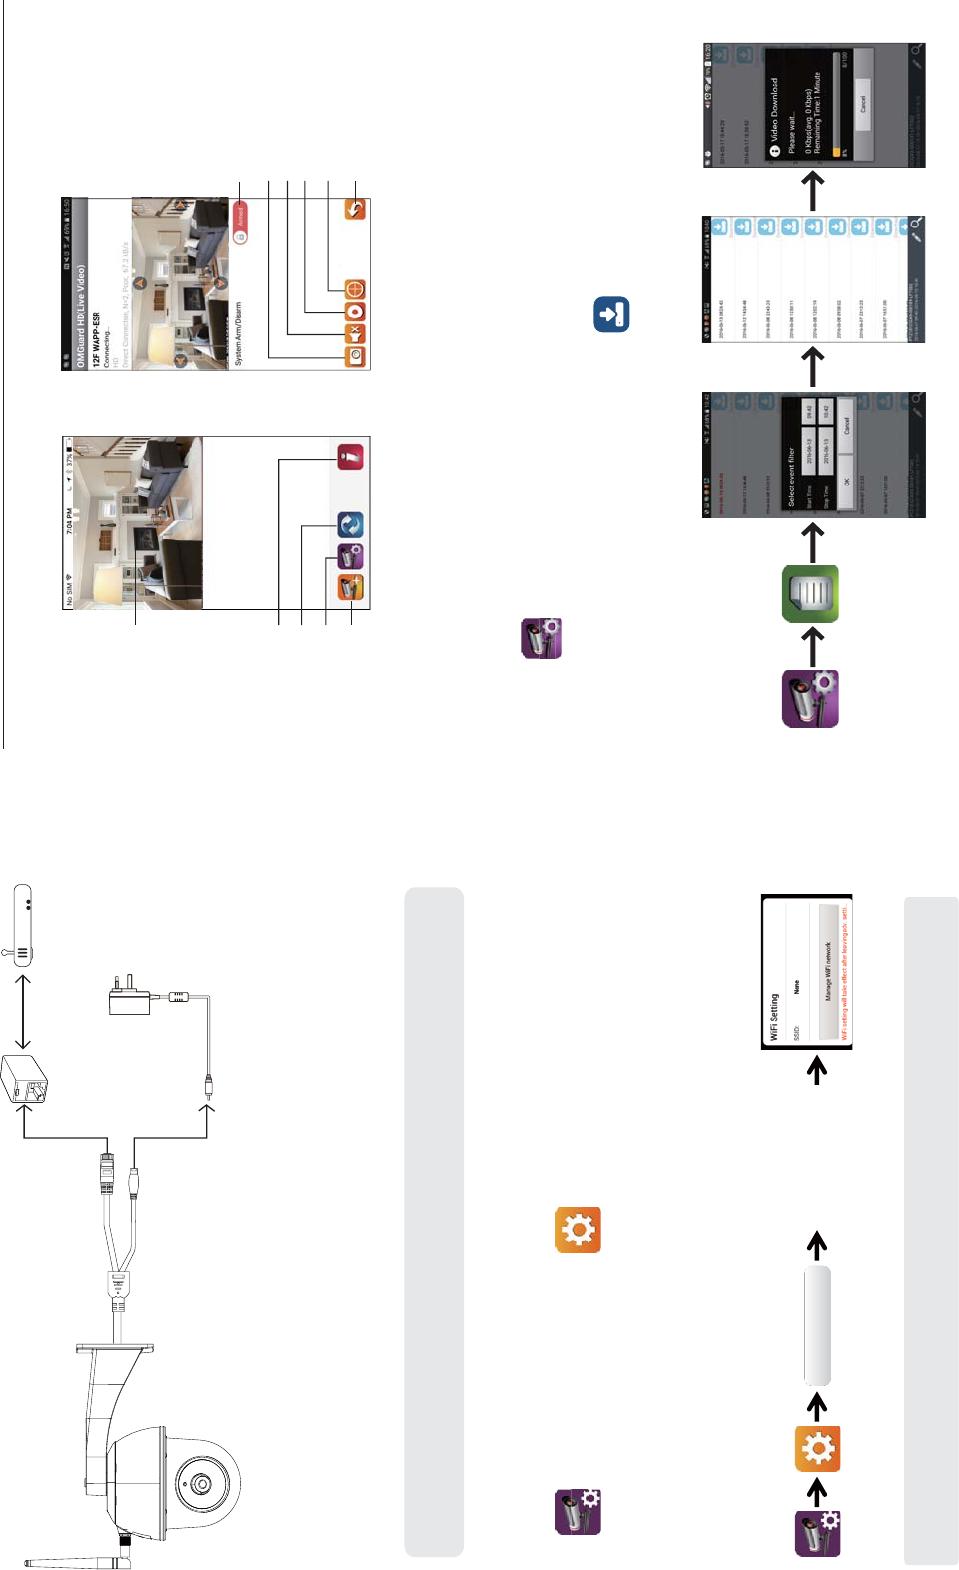 Ifi Network Pt Camera User Manual – Pixelmasterdesign